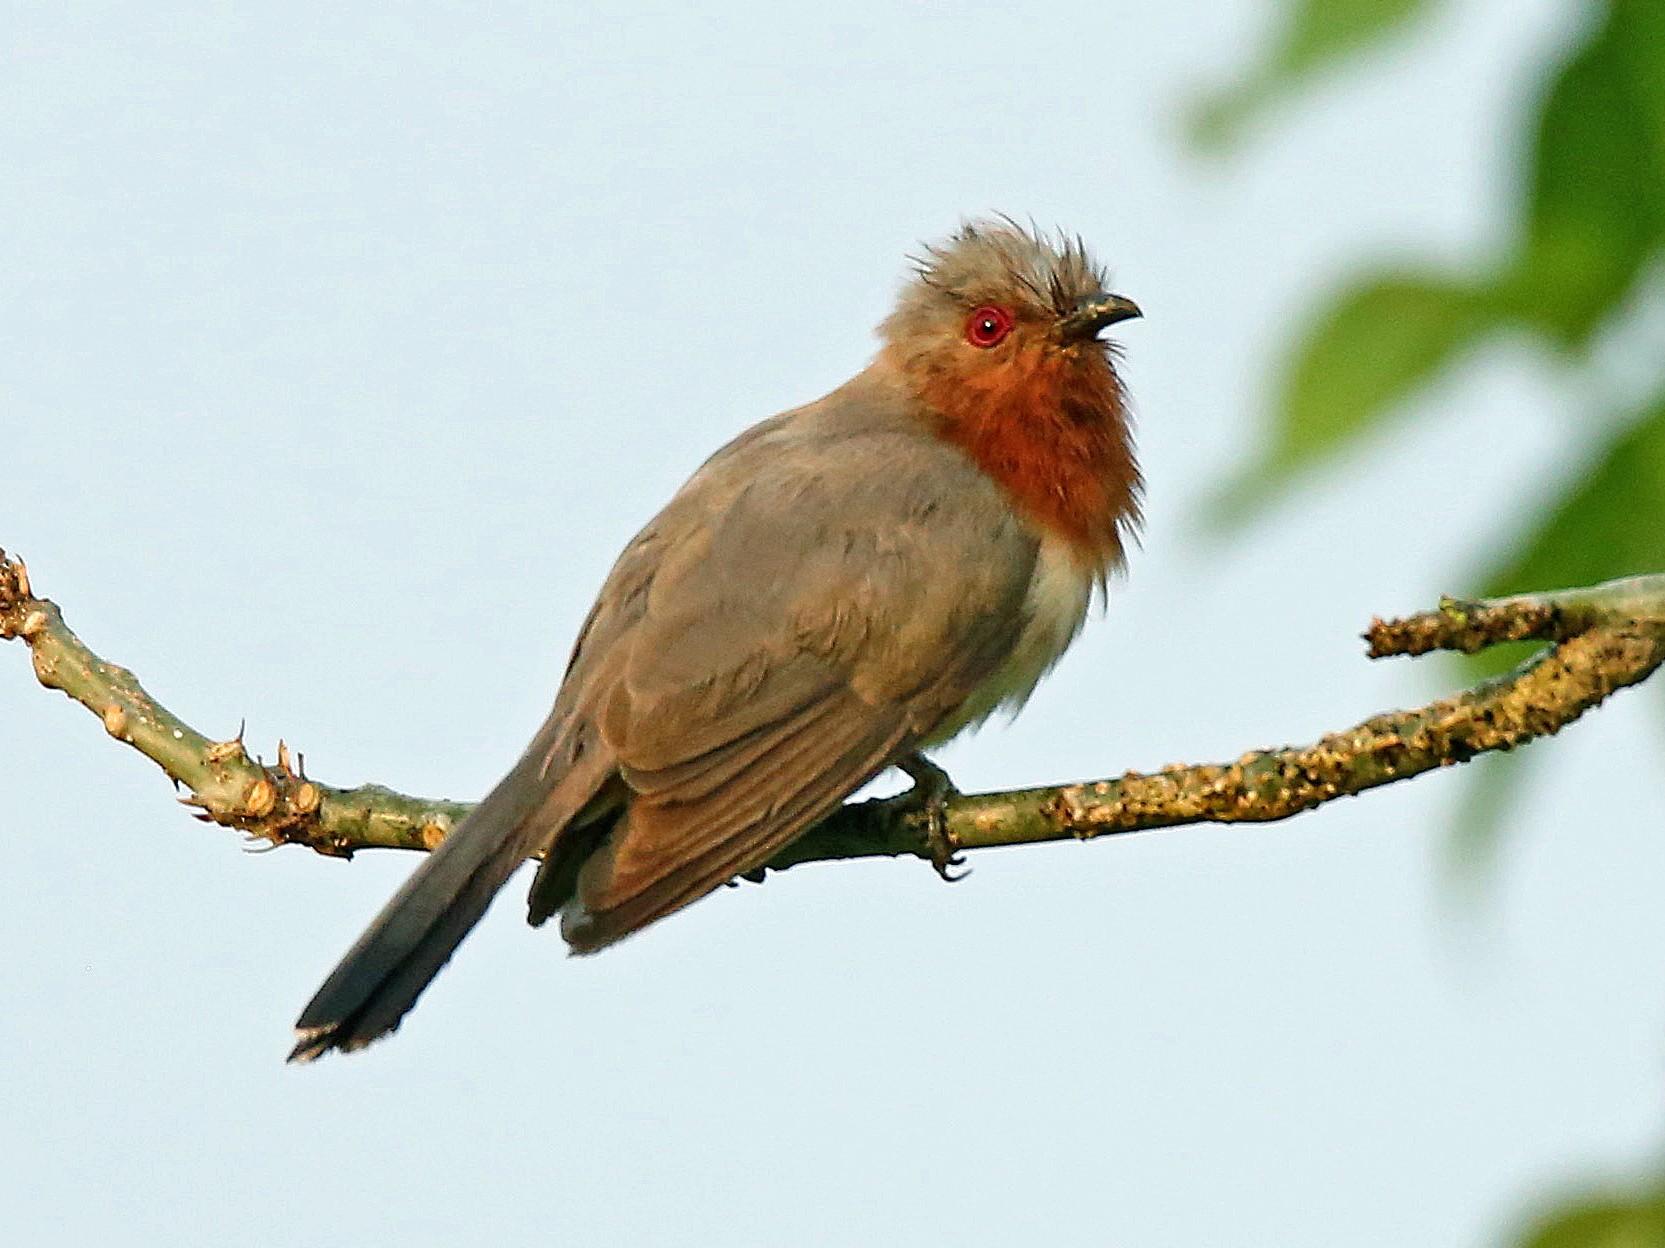 Dwarf Cuckoo - Roger Ahlman